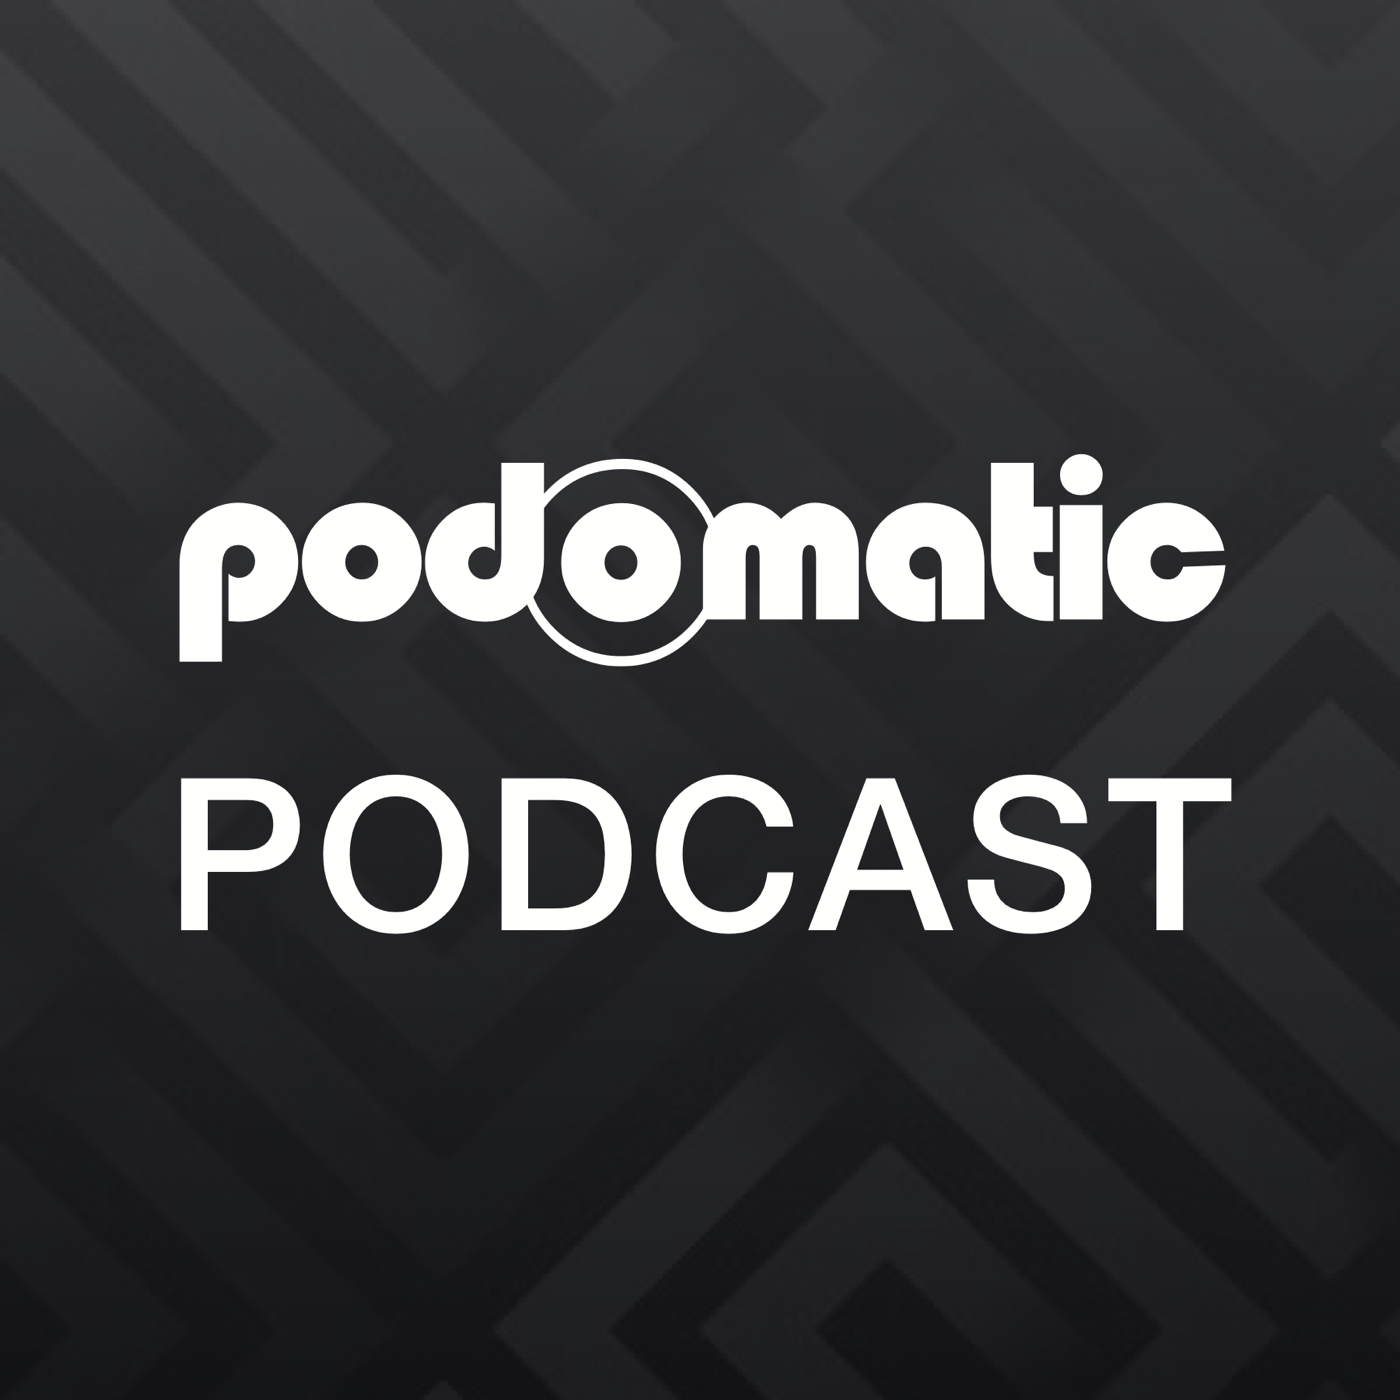 ScotchGaming Podcast